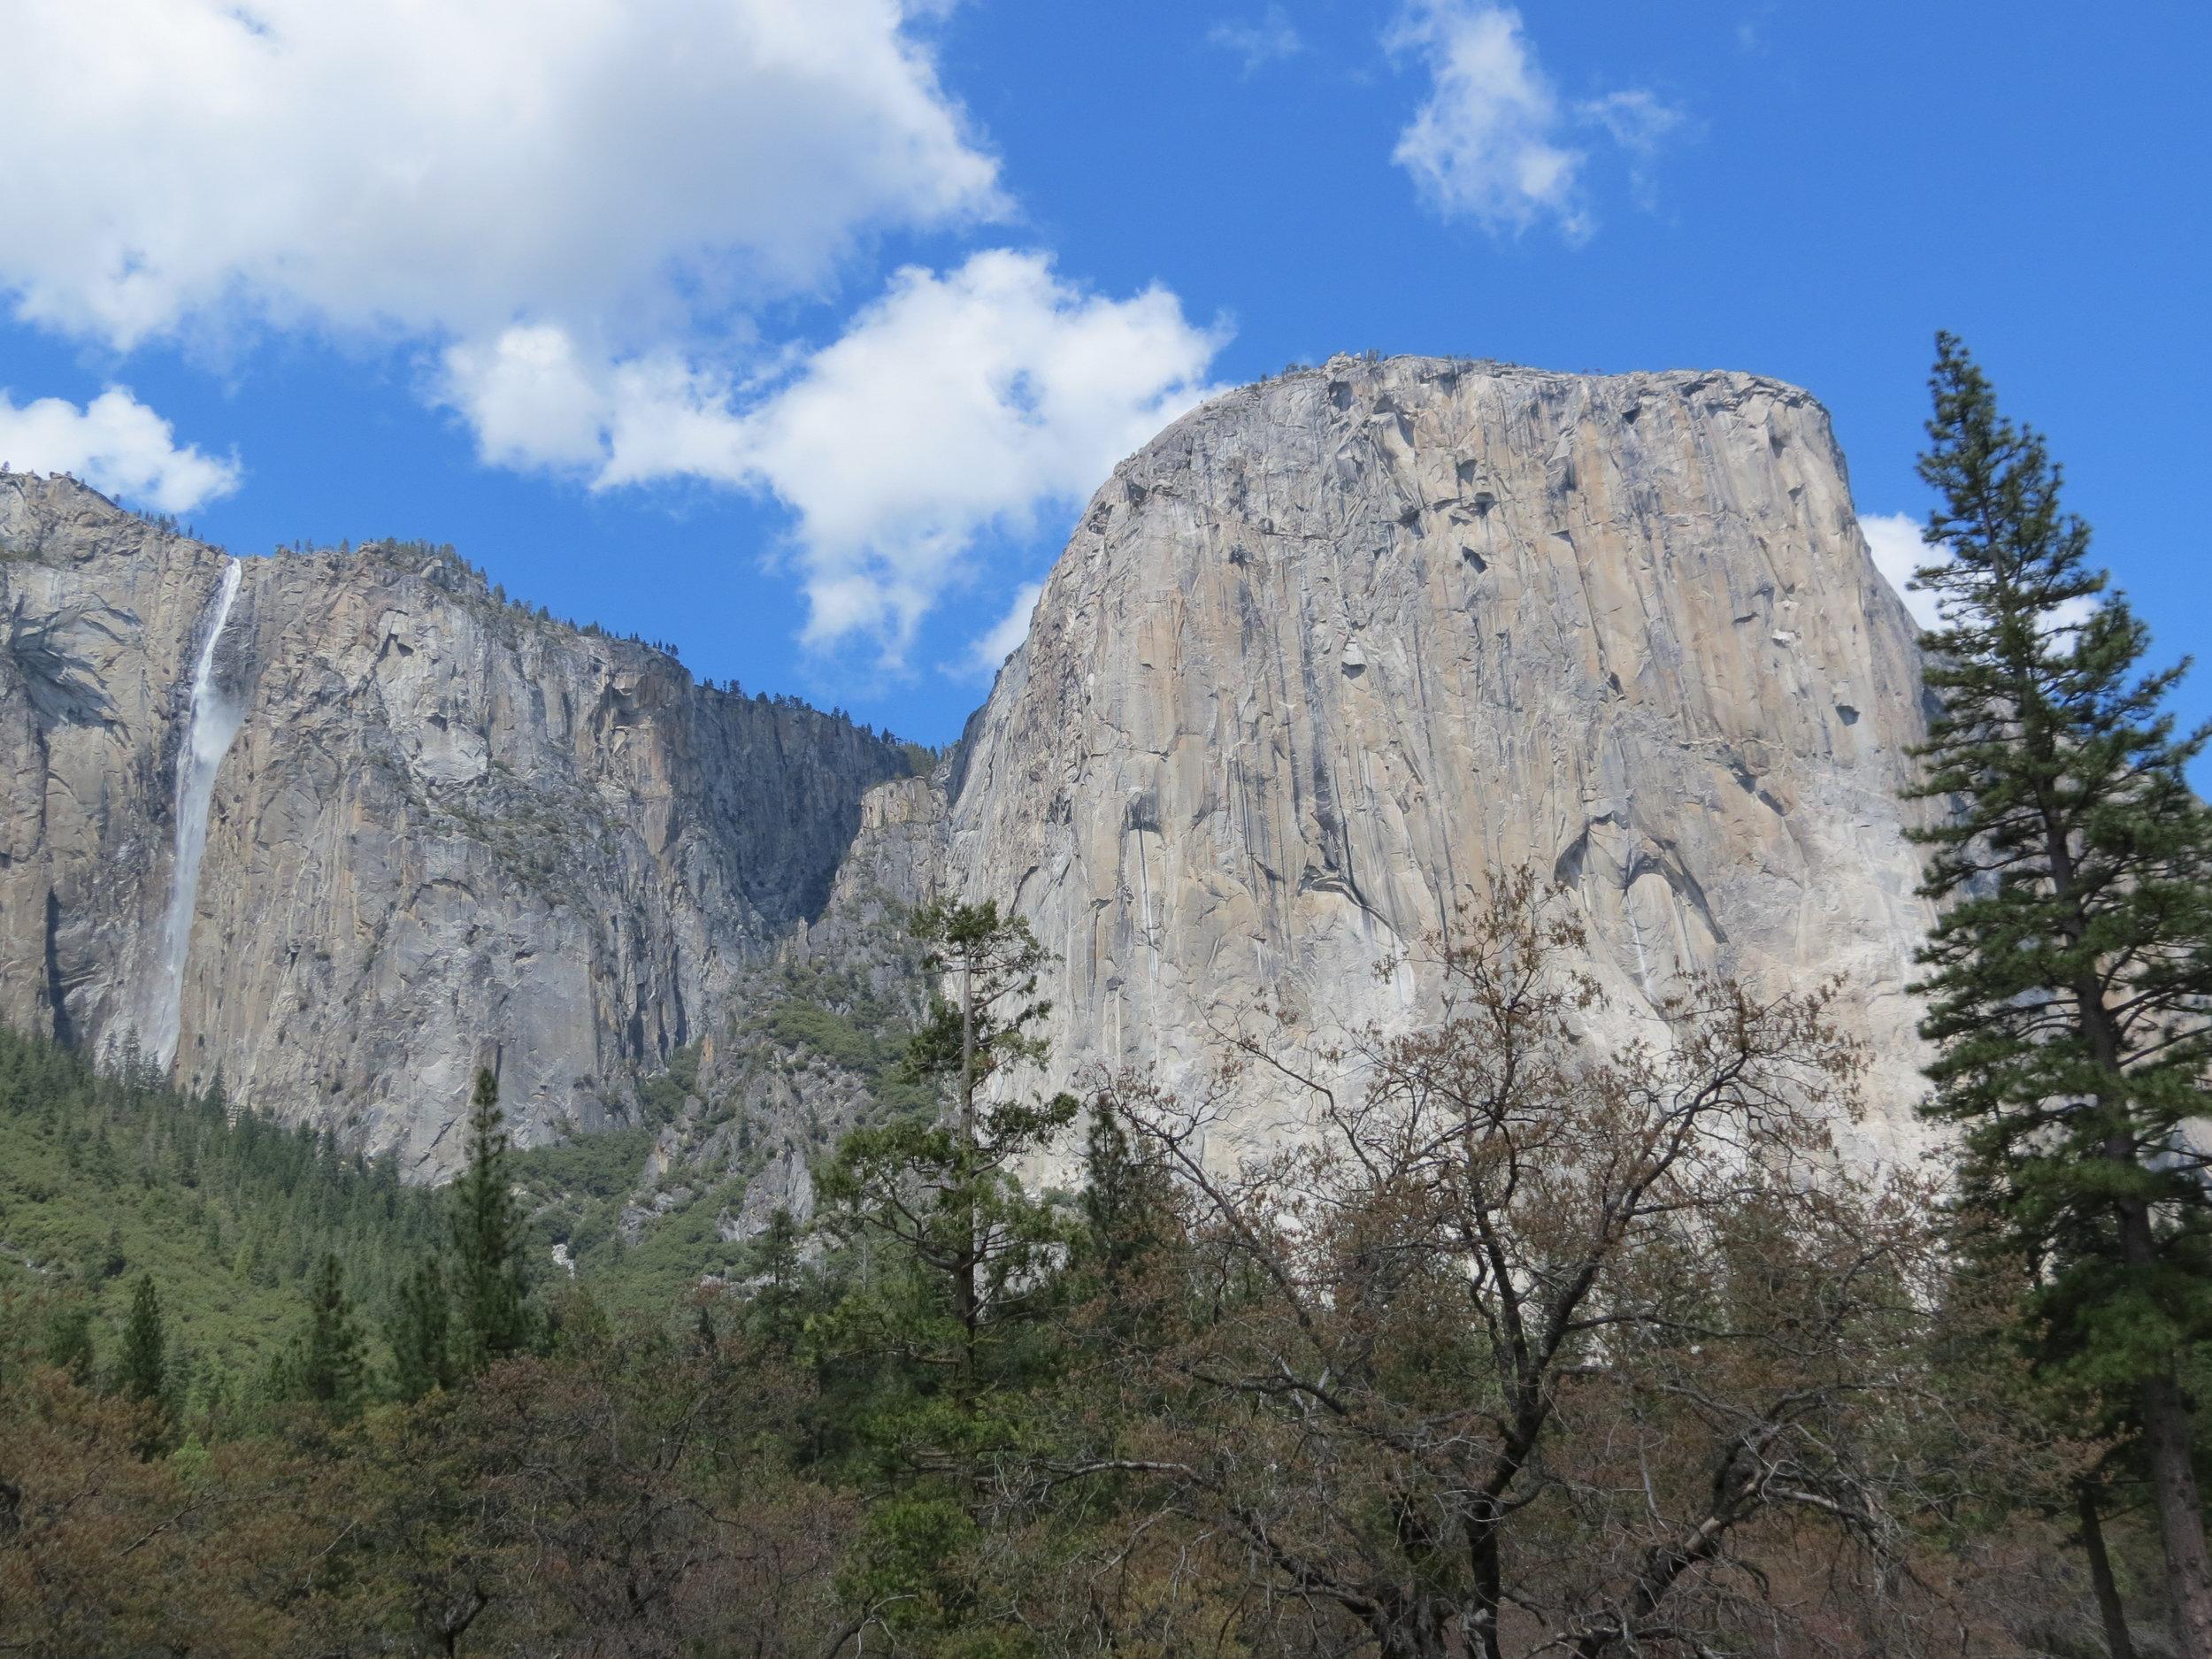 Yosemite National Park  - El Capitan - California - 2012